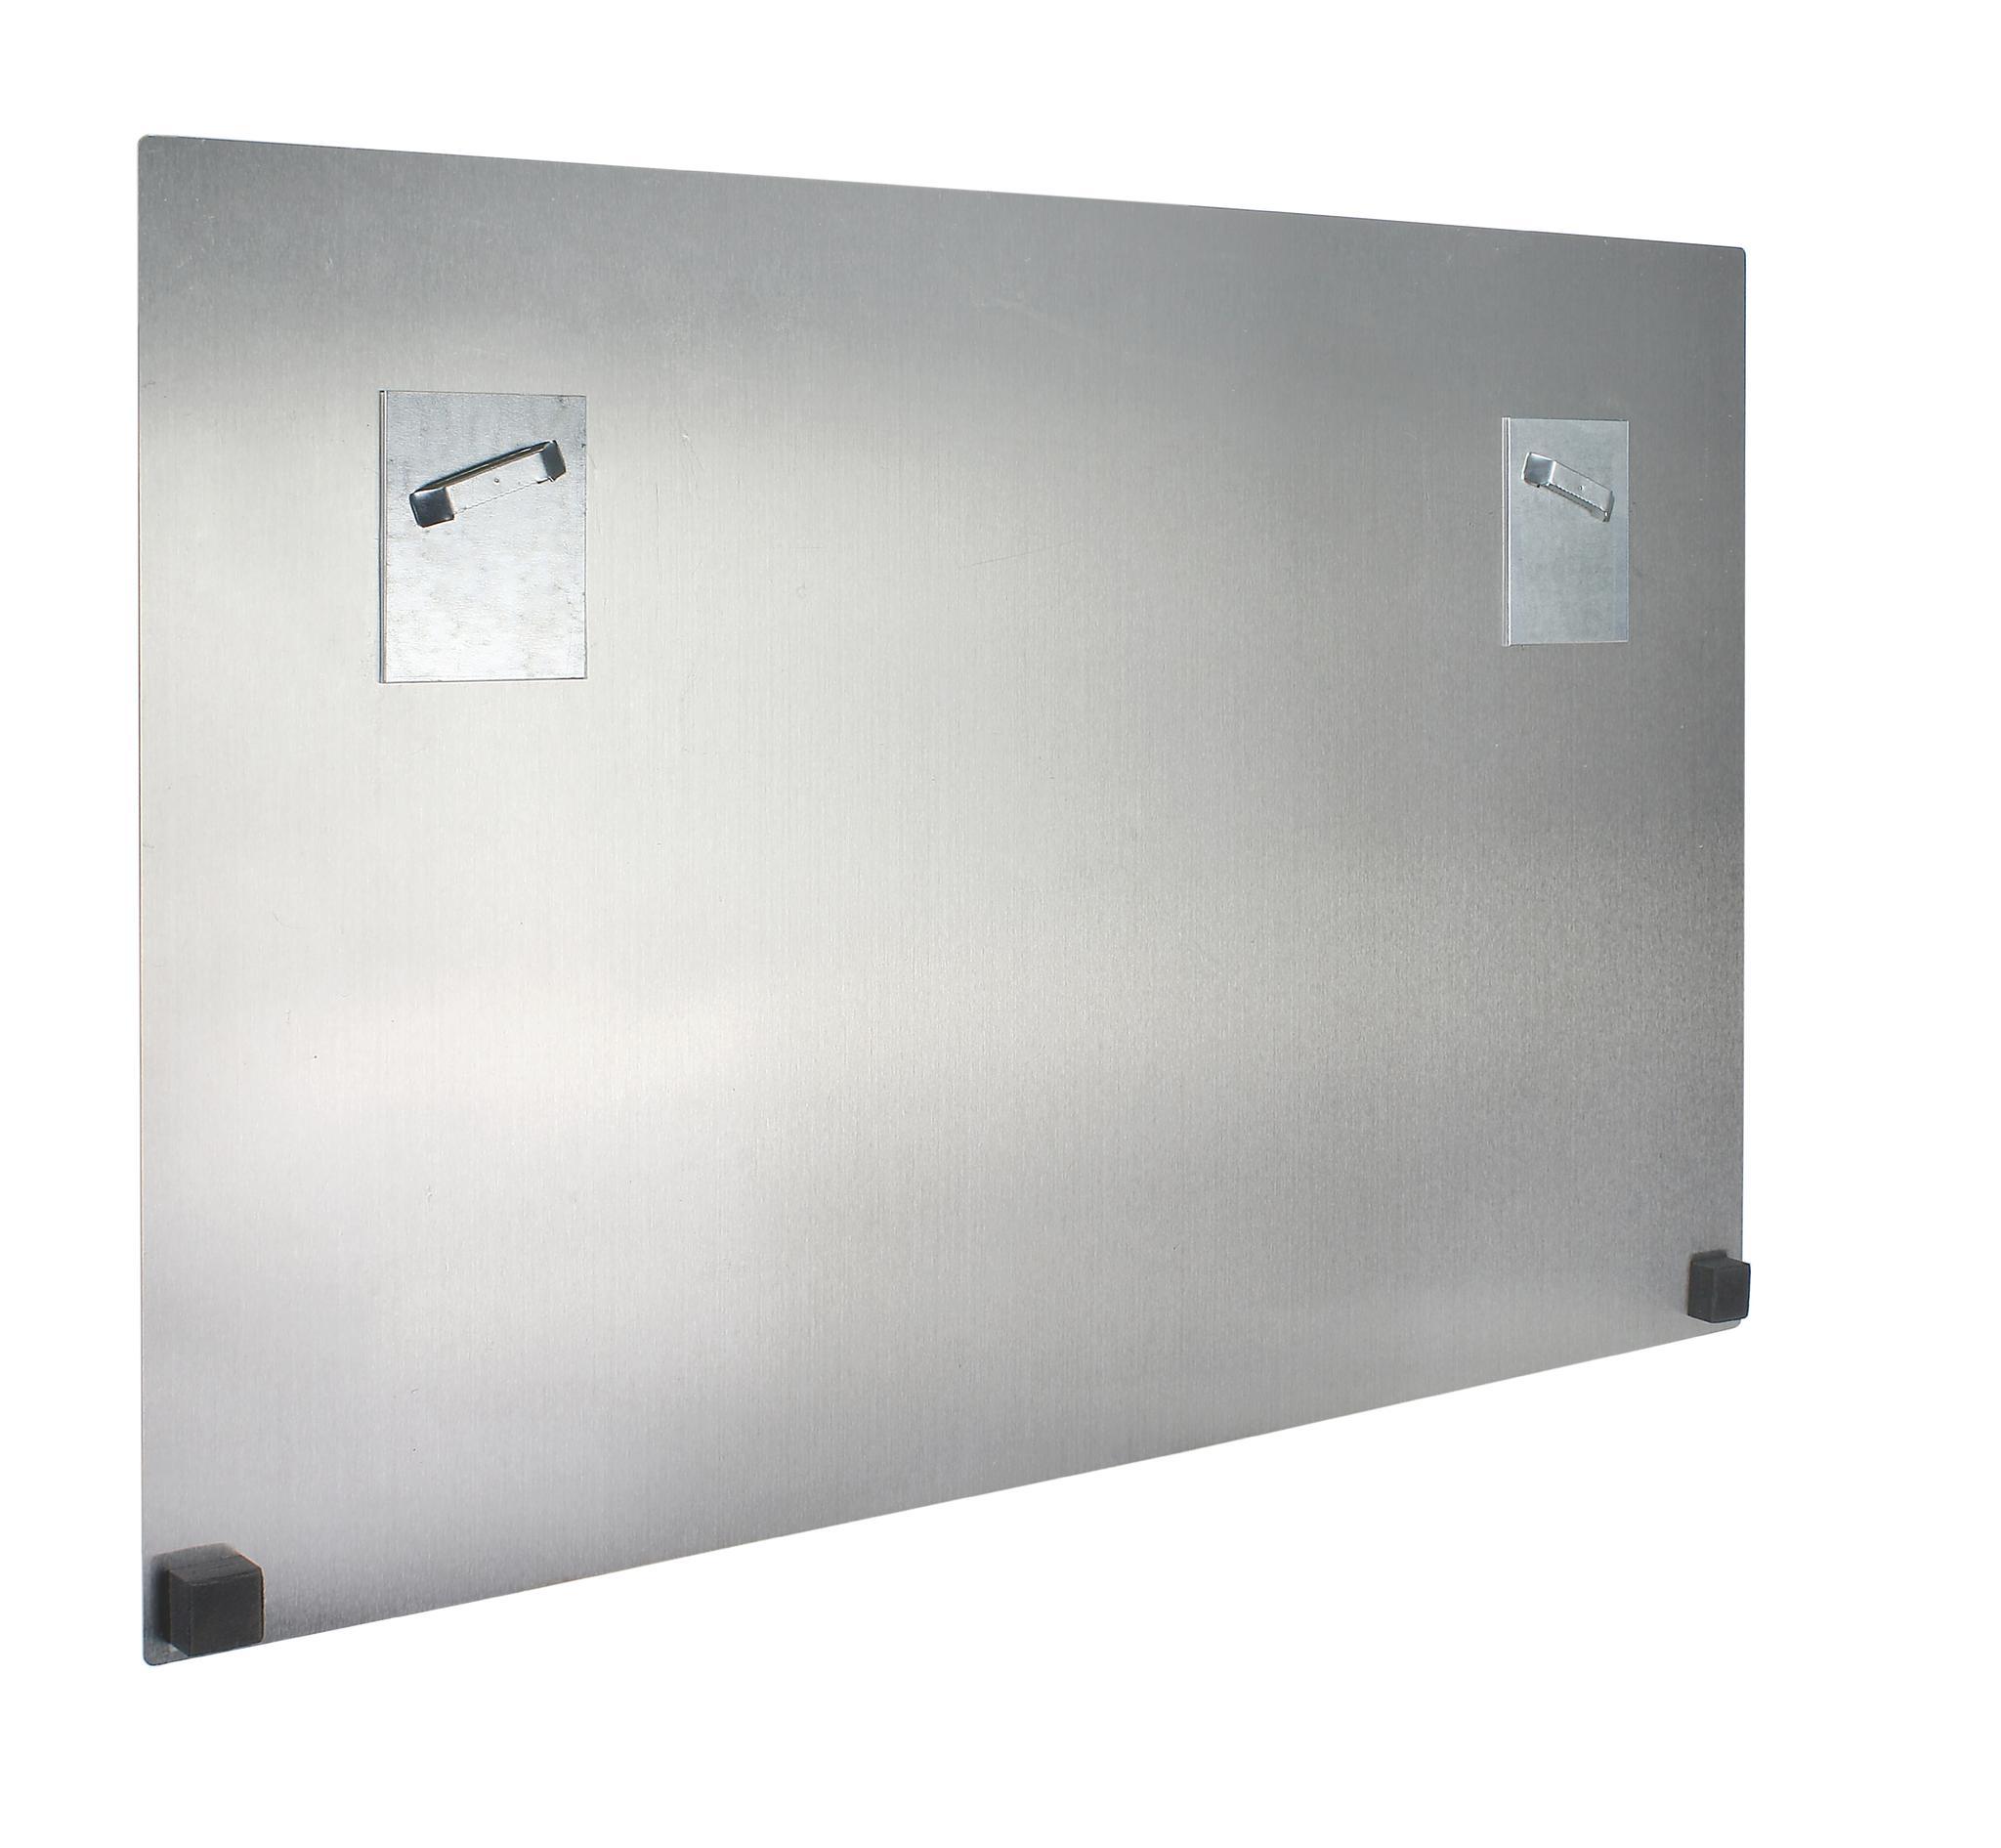 Self Adhesive Panel Hanging Plates